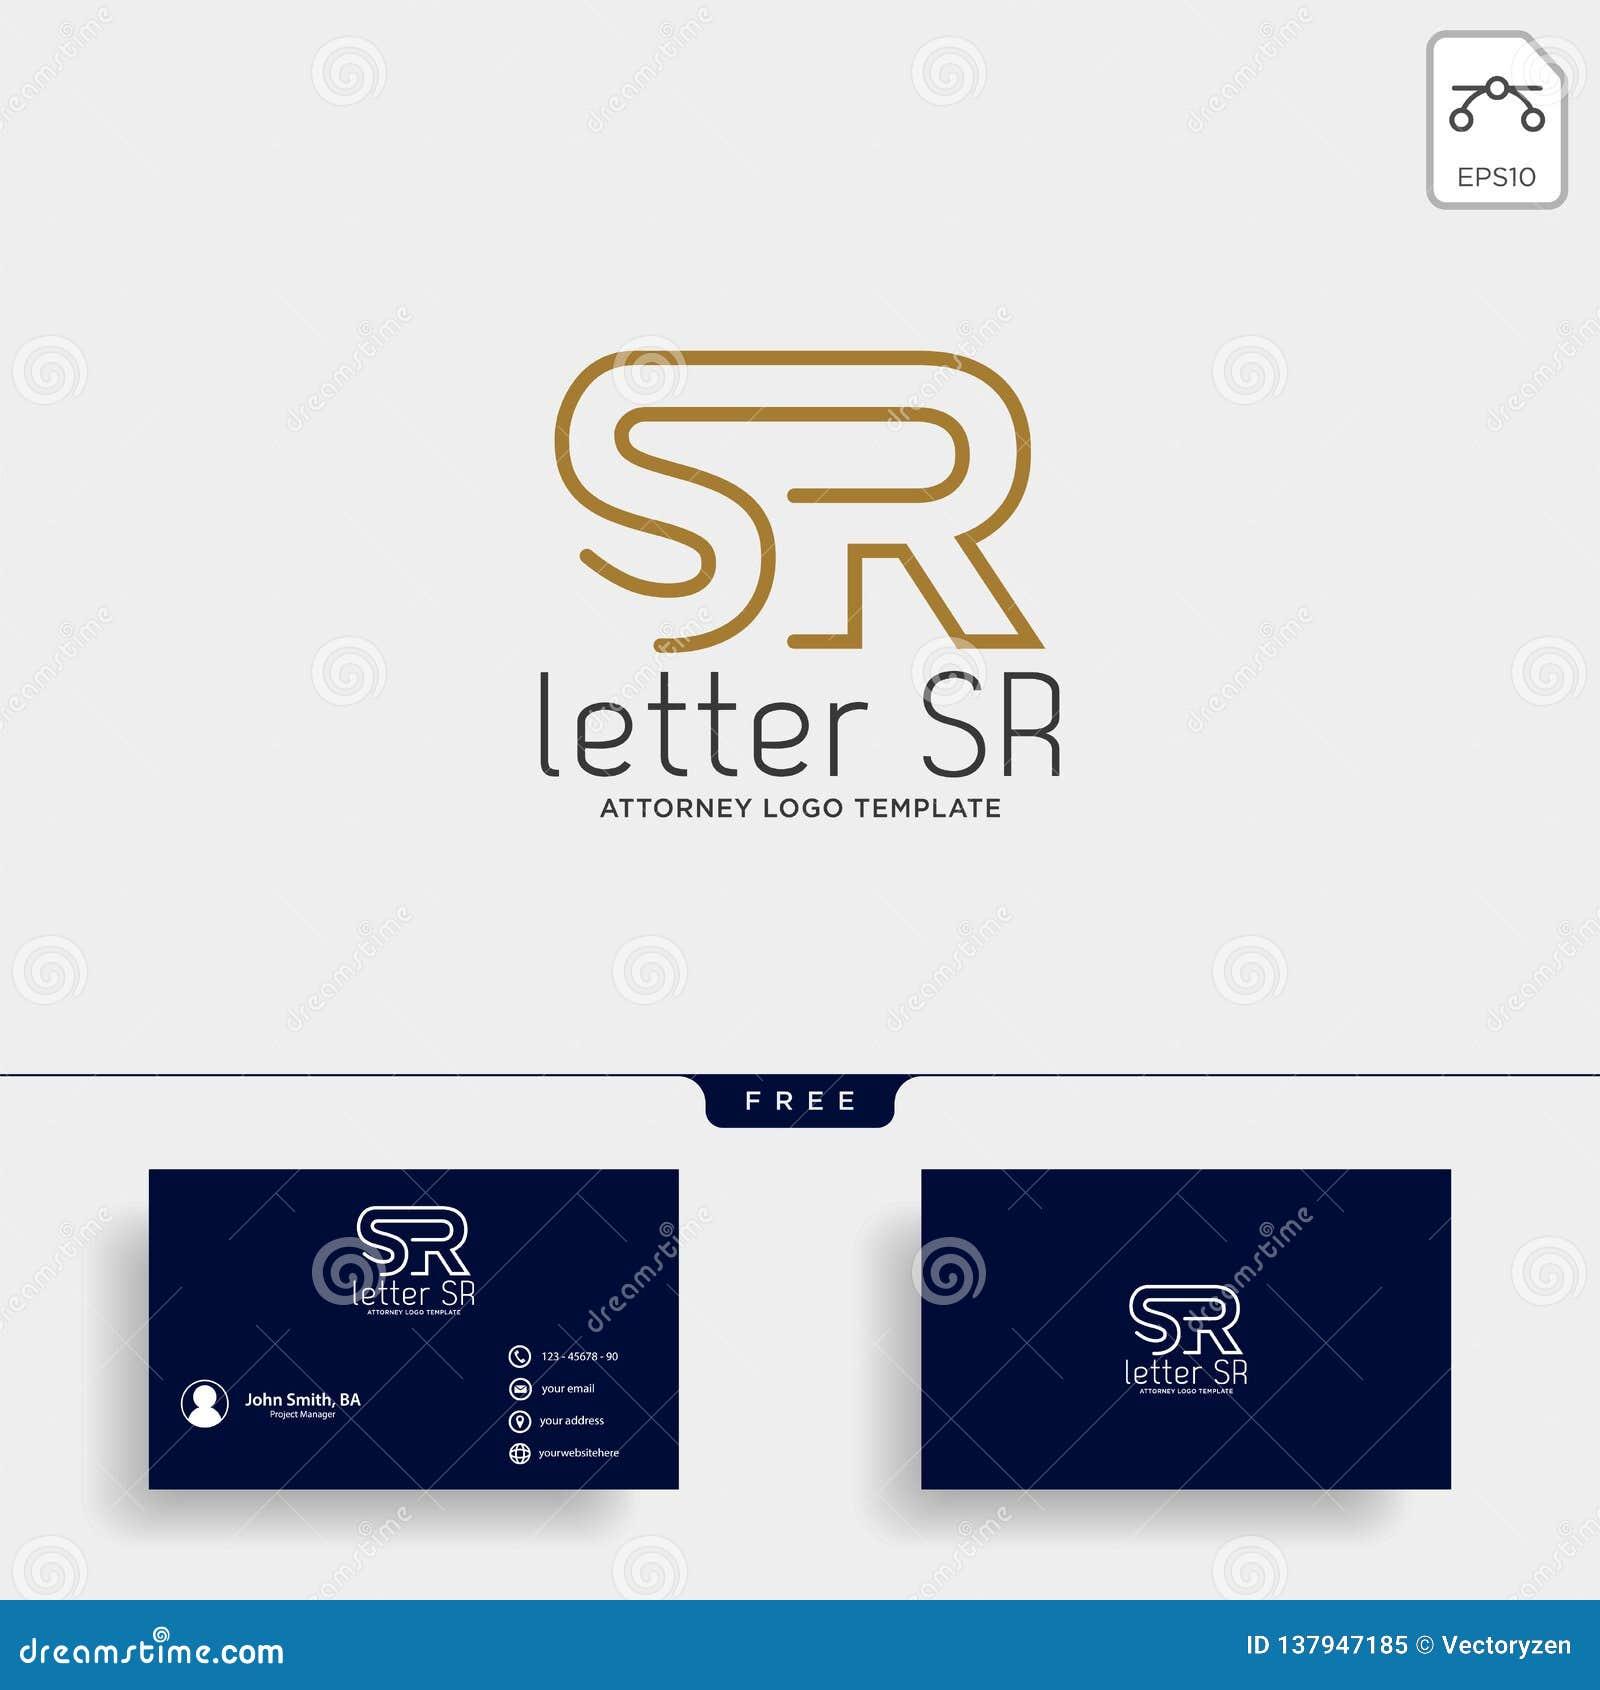 letter SR attorney logo line design template vector illustration